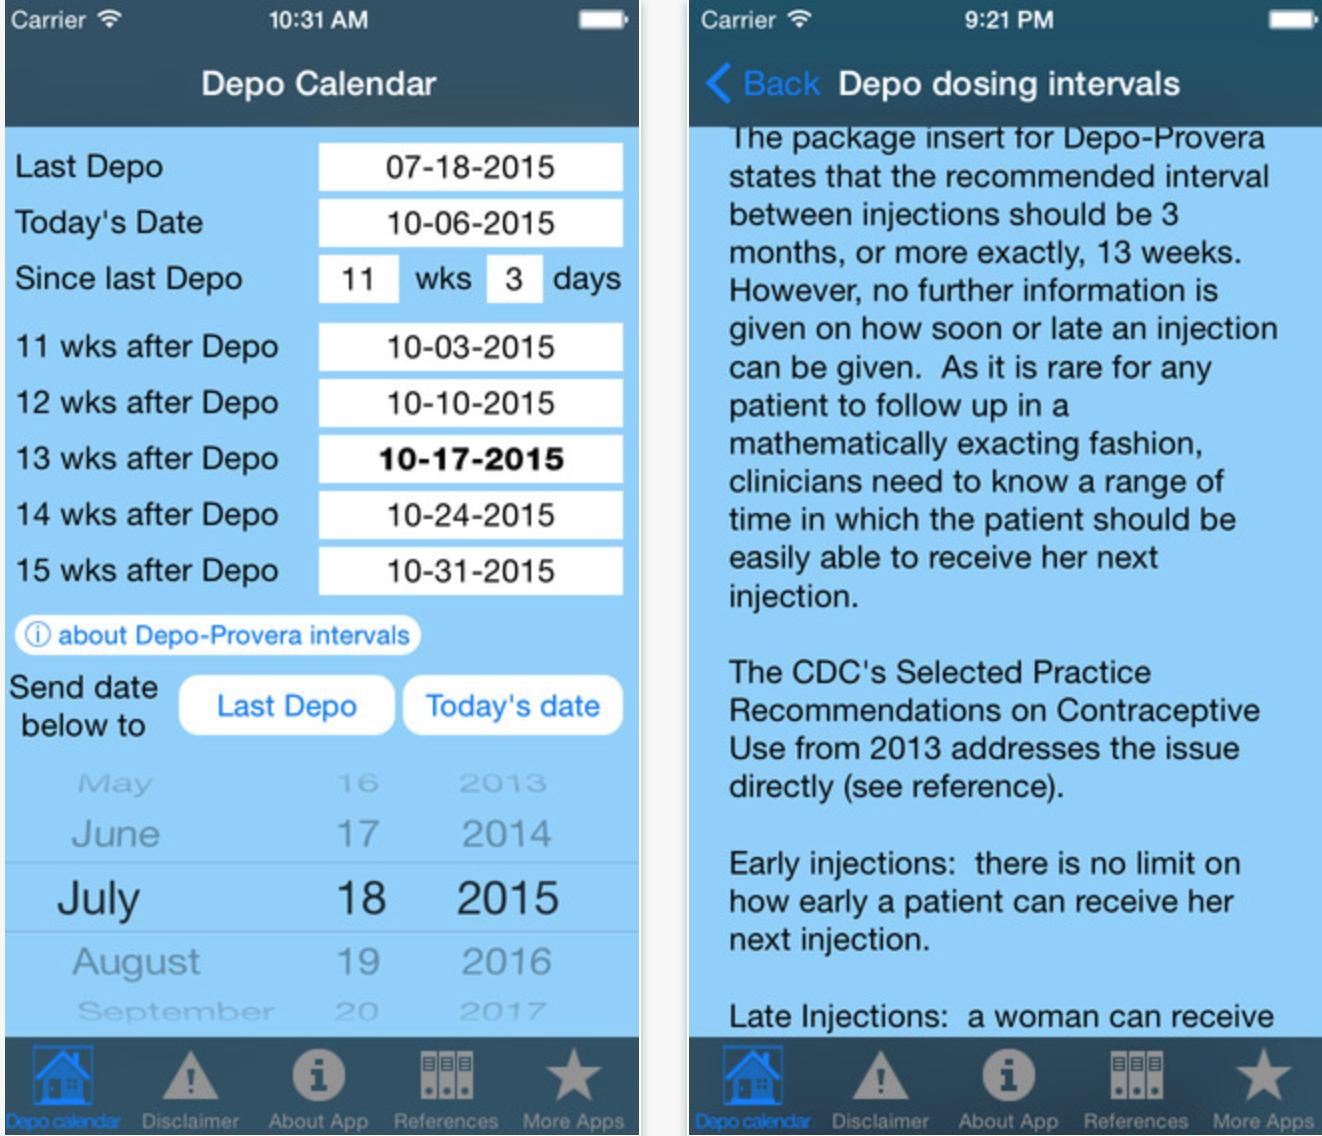 Depo Calendar App Could Significantly Improve Contraception regarding Depo Calendar